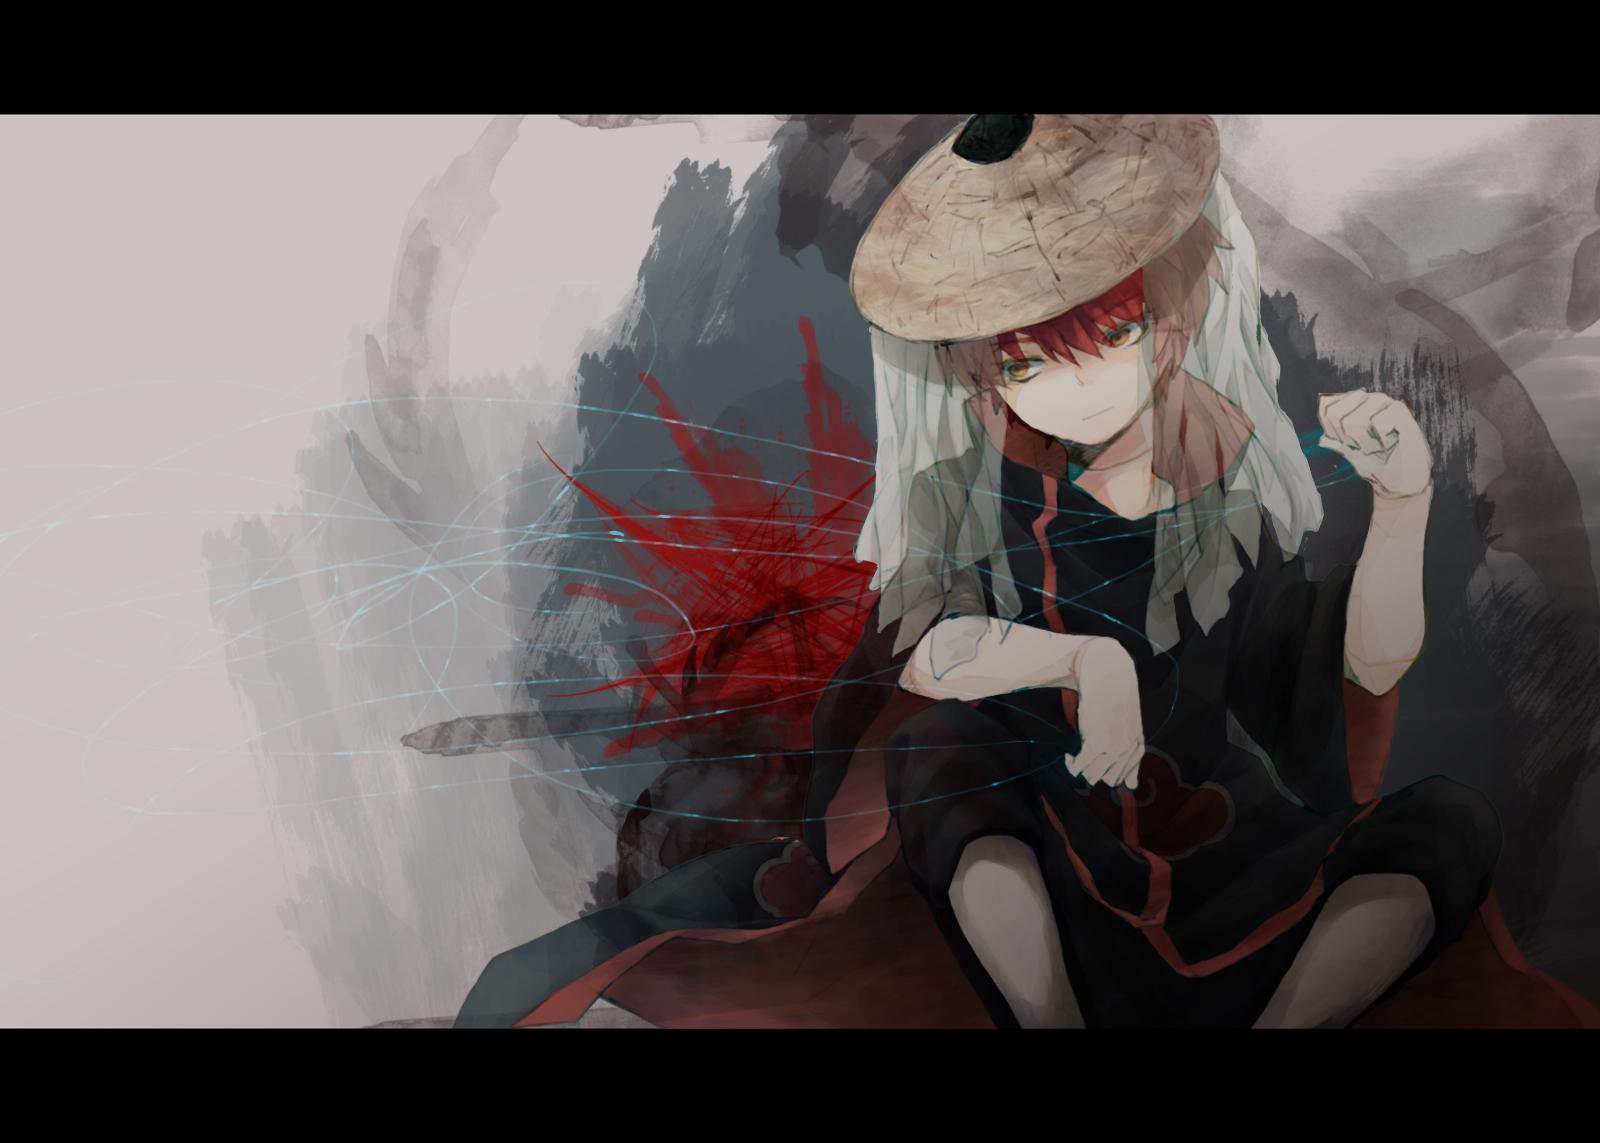 akatsuki id sasori by - photo #7